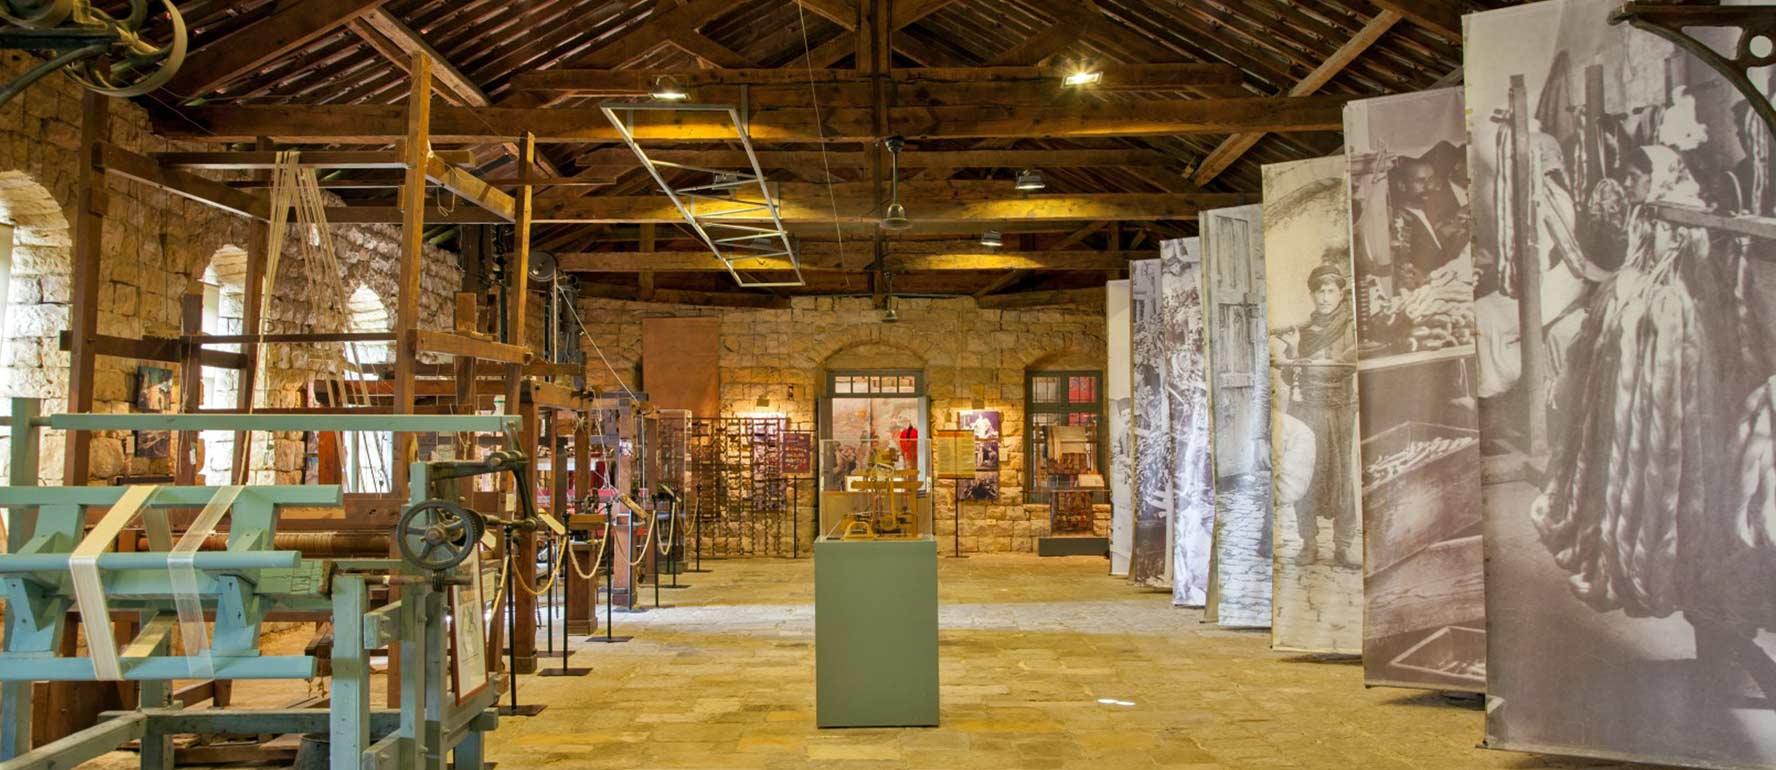 The Silk Museum 365 Days Of Lebanon